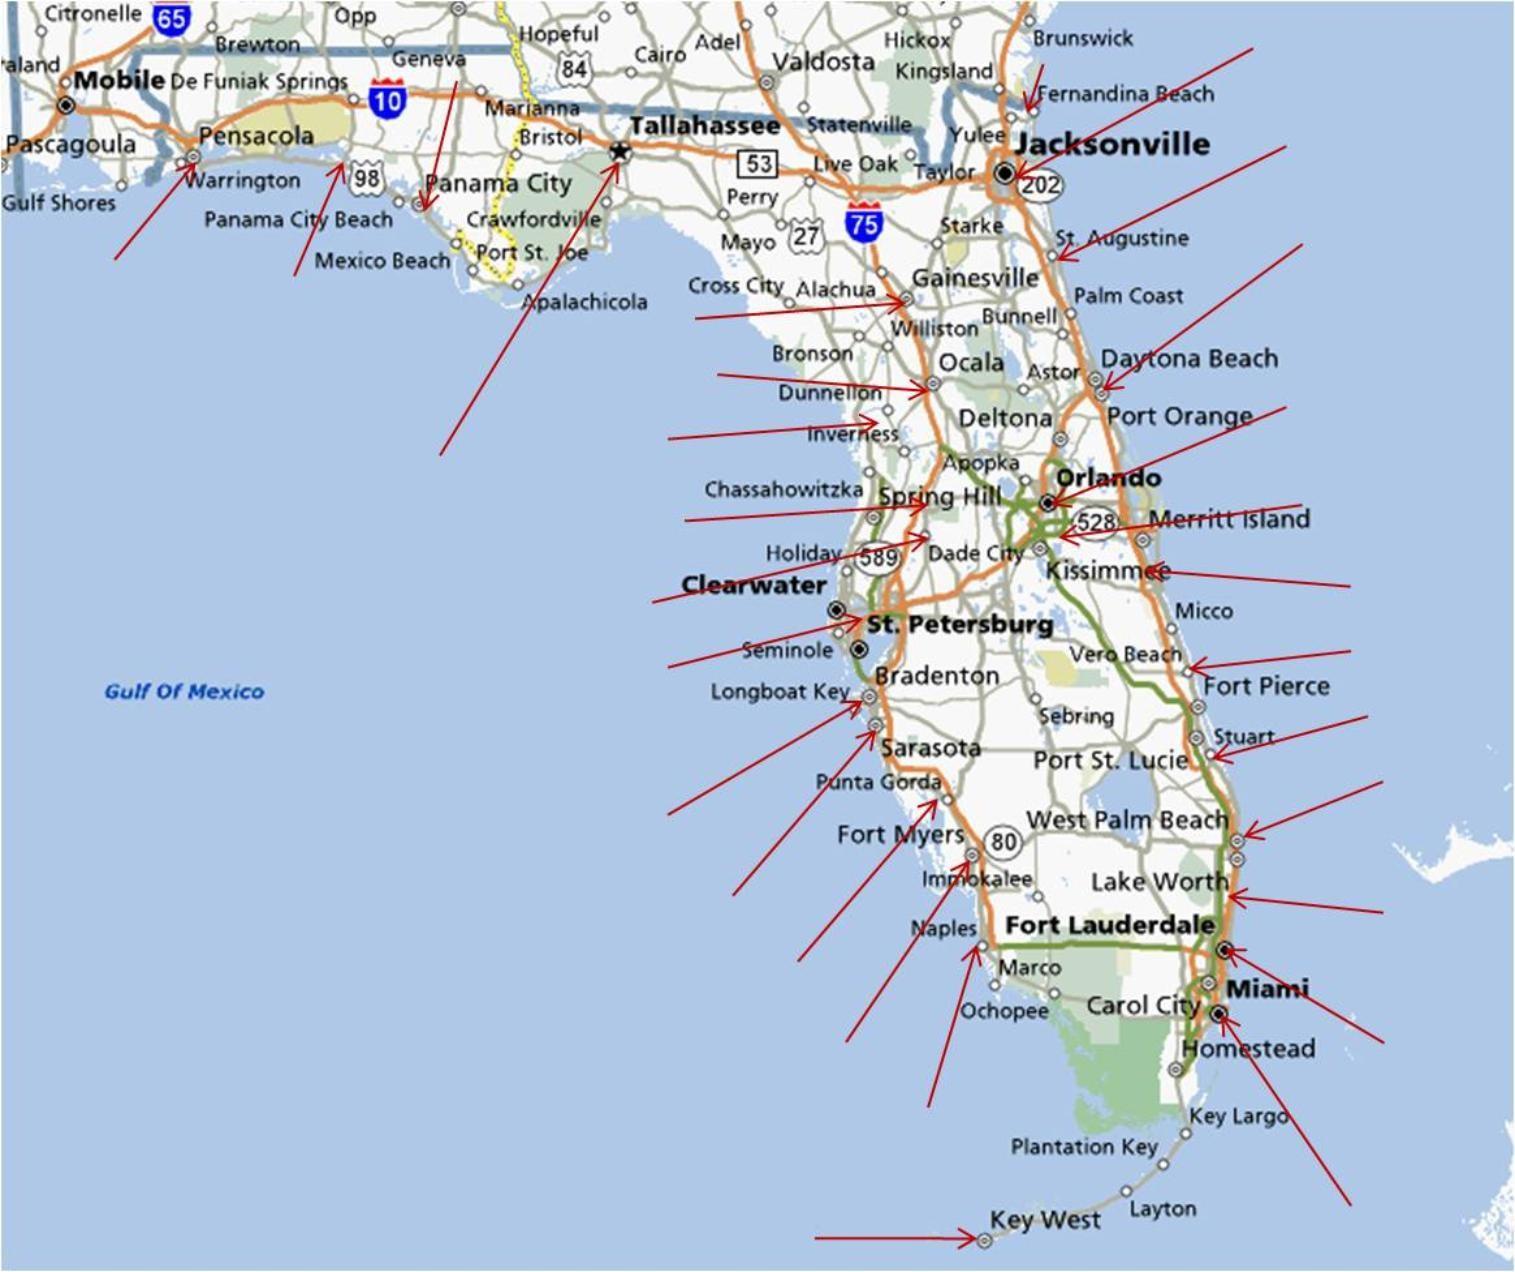 Mexico Beach Florida Map From Windsurfaddicts 9 - Judecelestin2010 - Where Is Panama City Florida On The Map